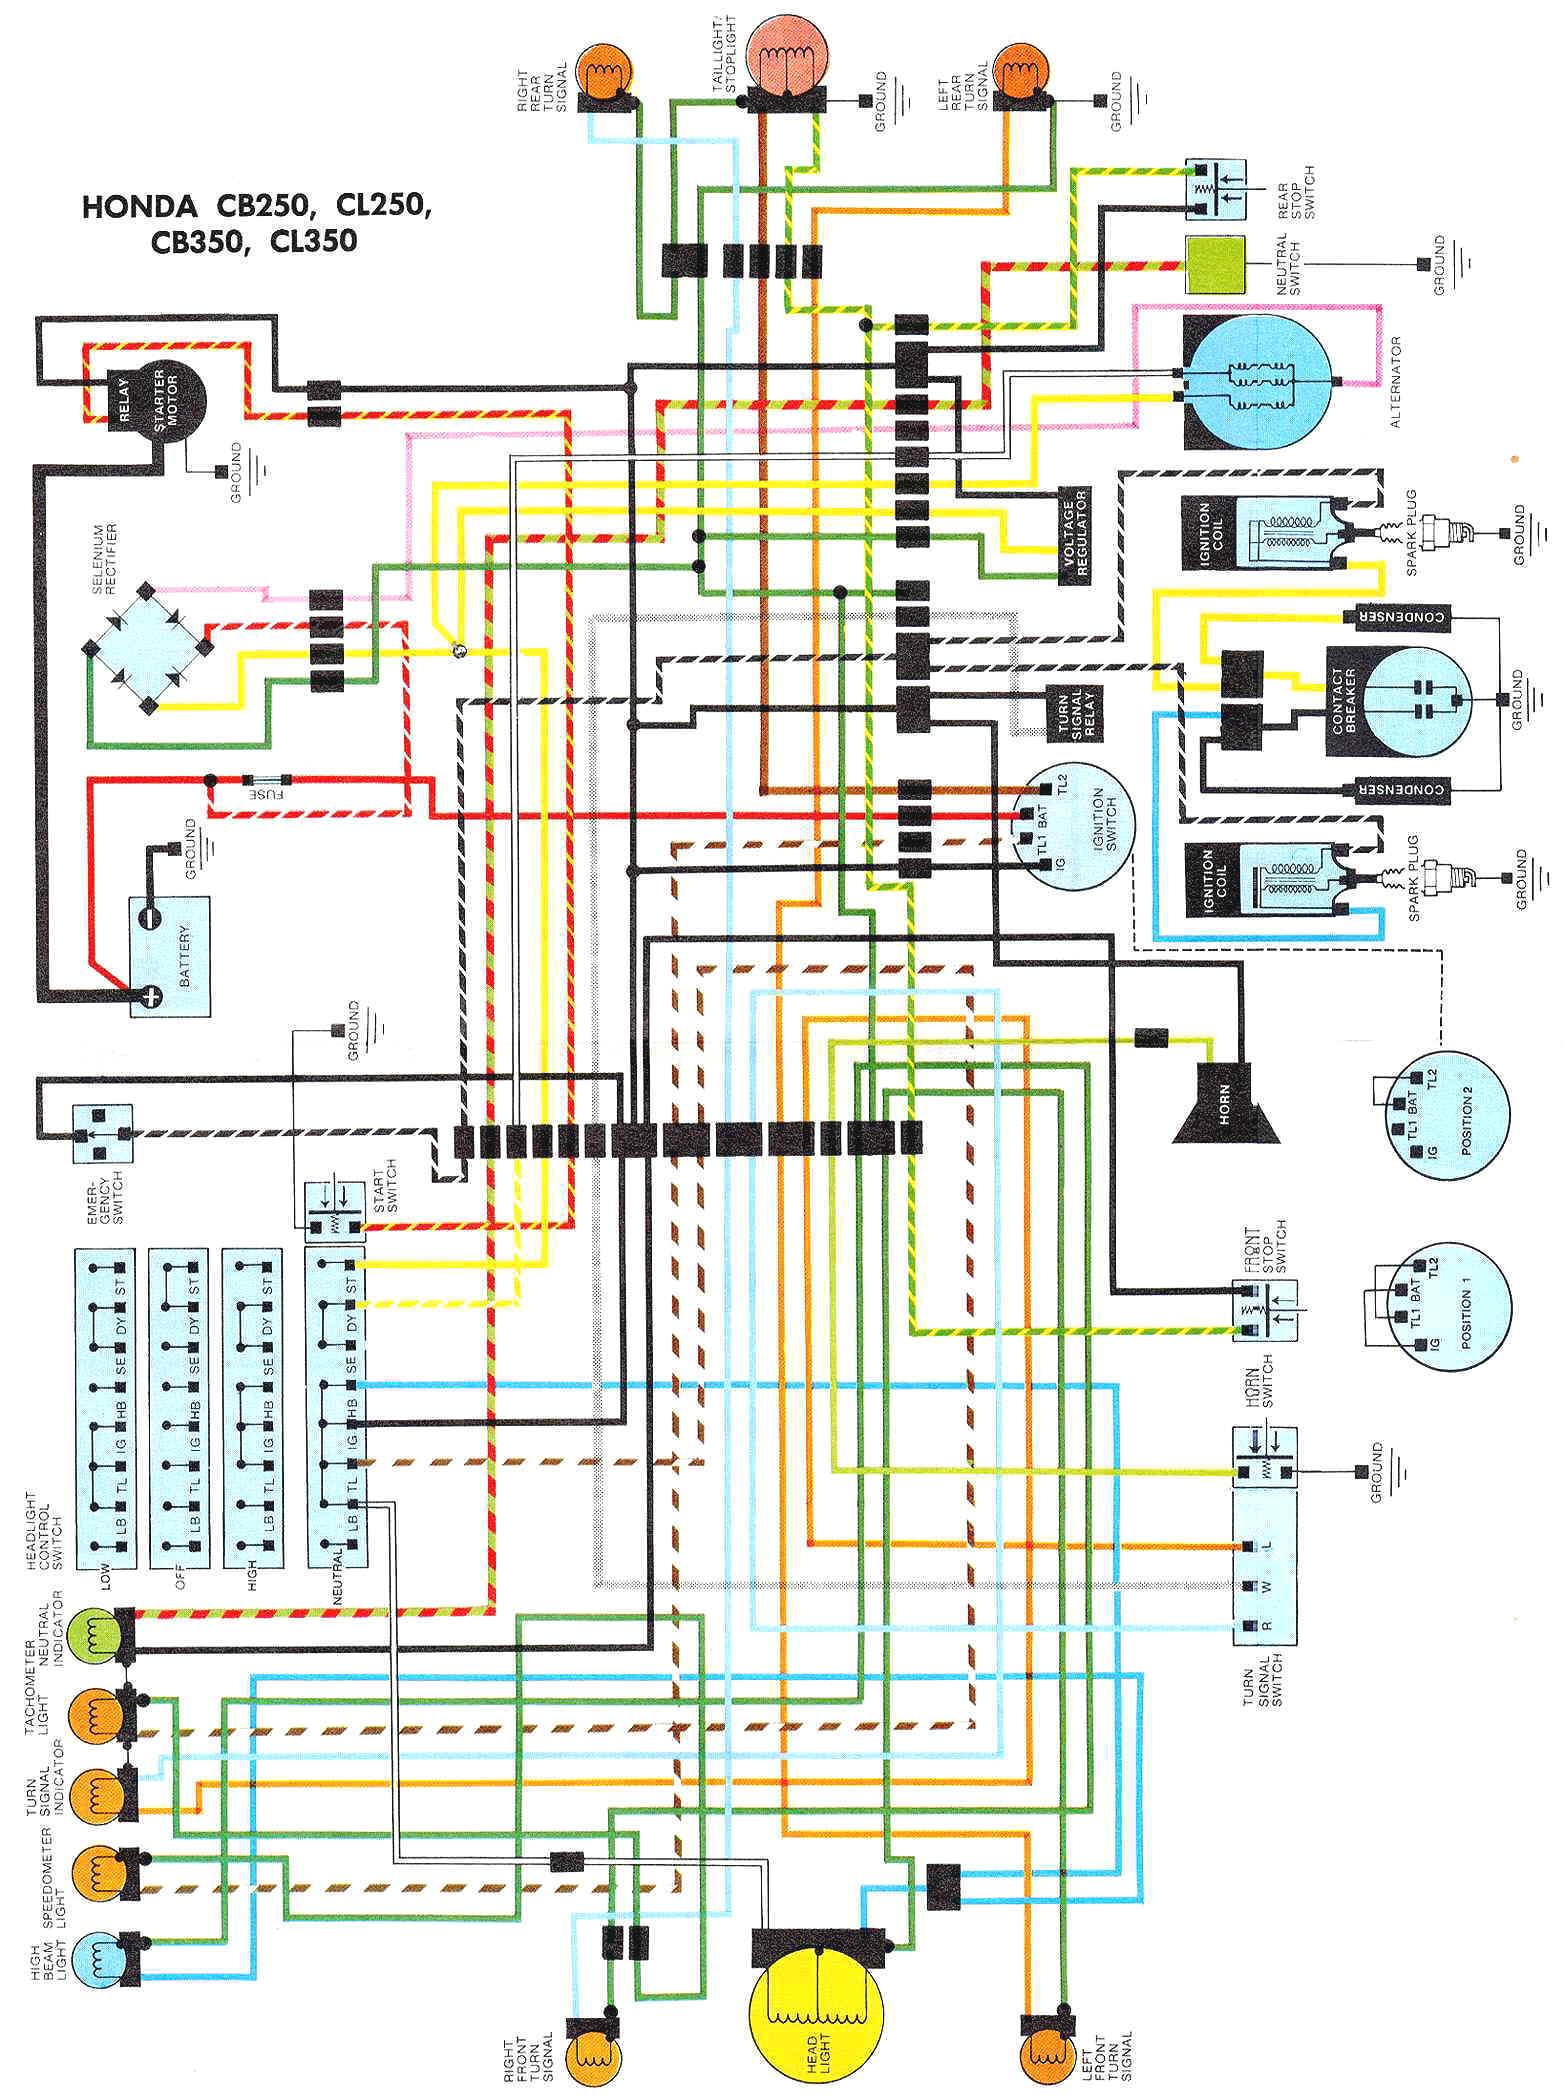 honda vt700 wiring diagrams honda get free image about 1984 honda shadow vt700 wiring diagram 1984 [ 1000 x 1342 Pixel ]